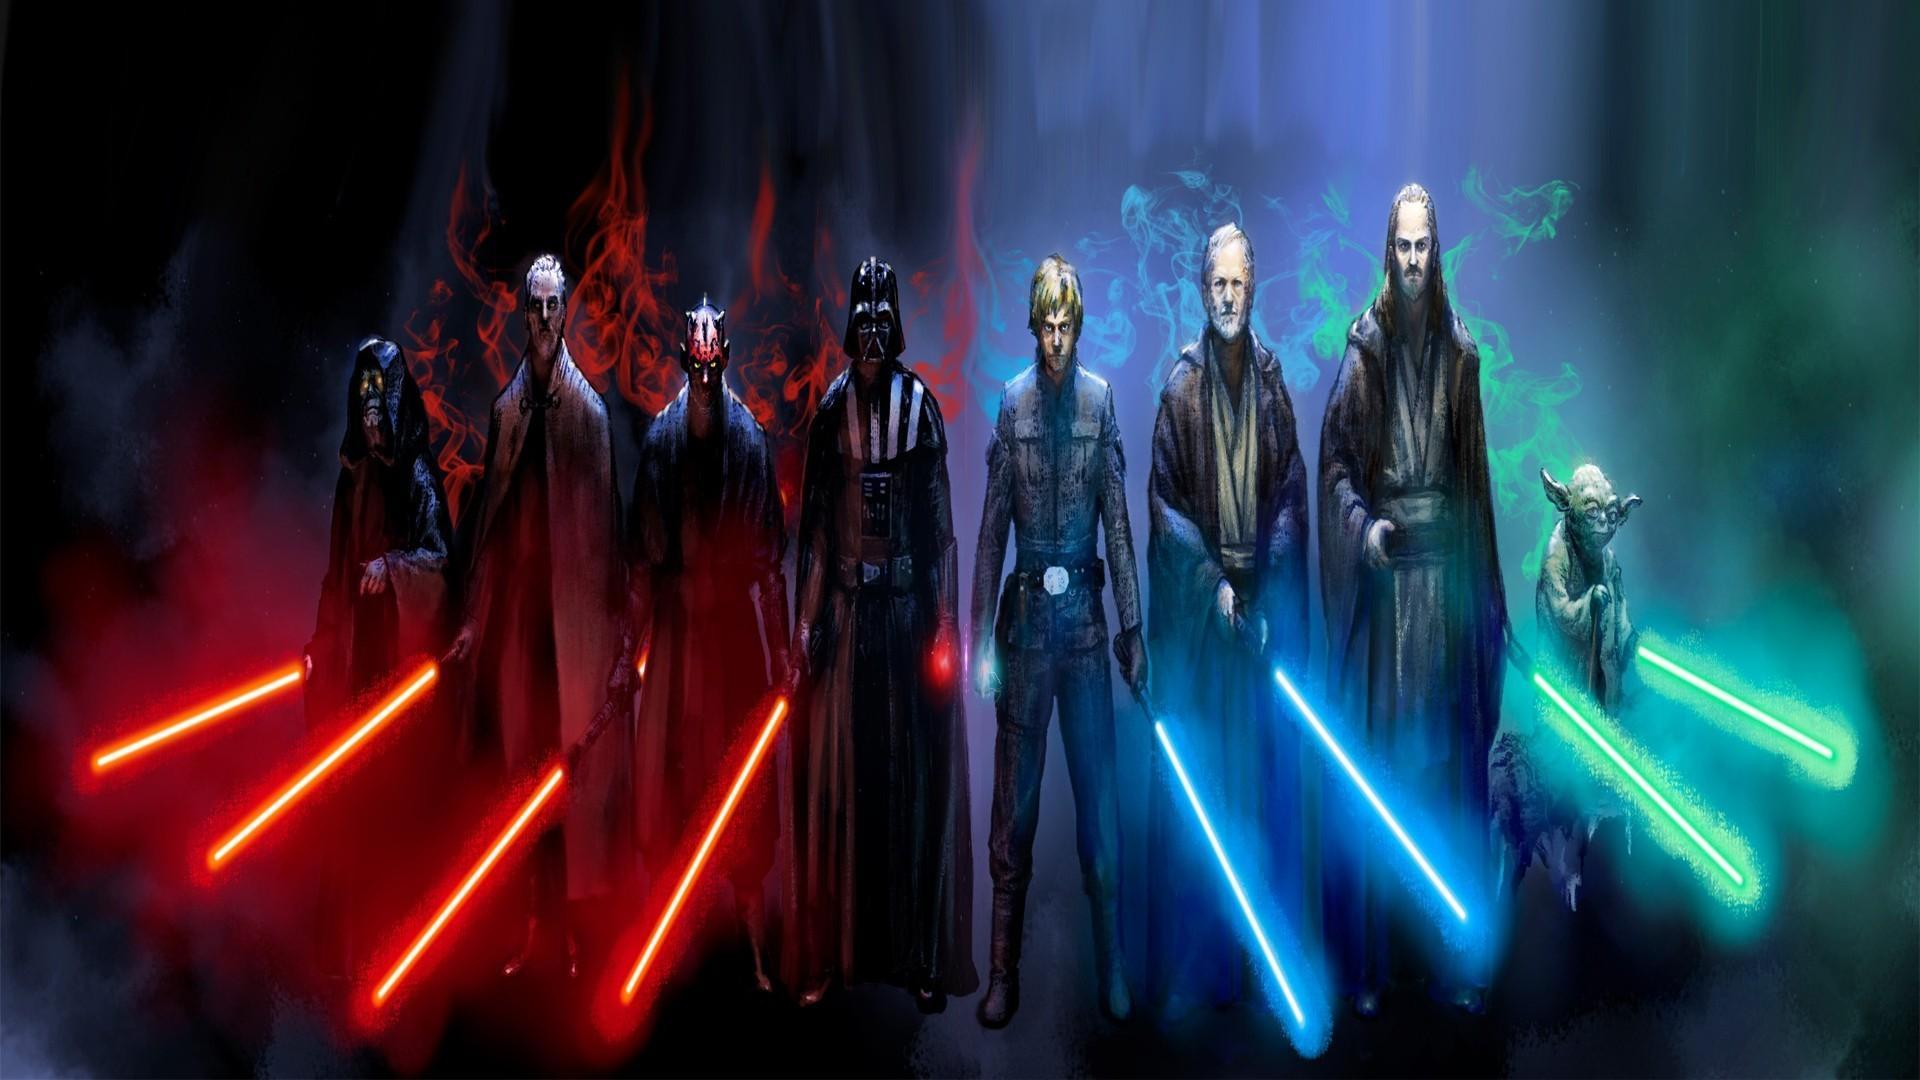 Hd lightsaber wallpaper wallpapersafari - Jedi wallpaper ...